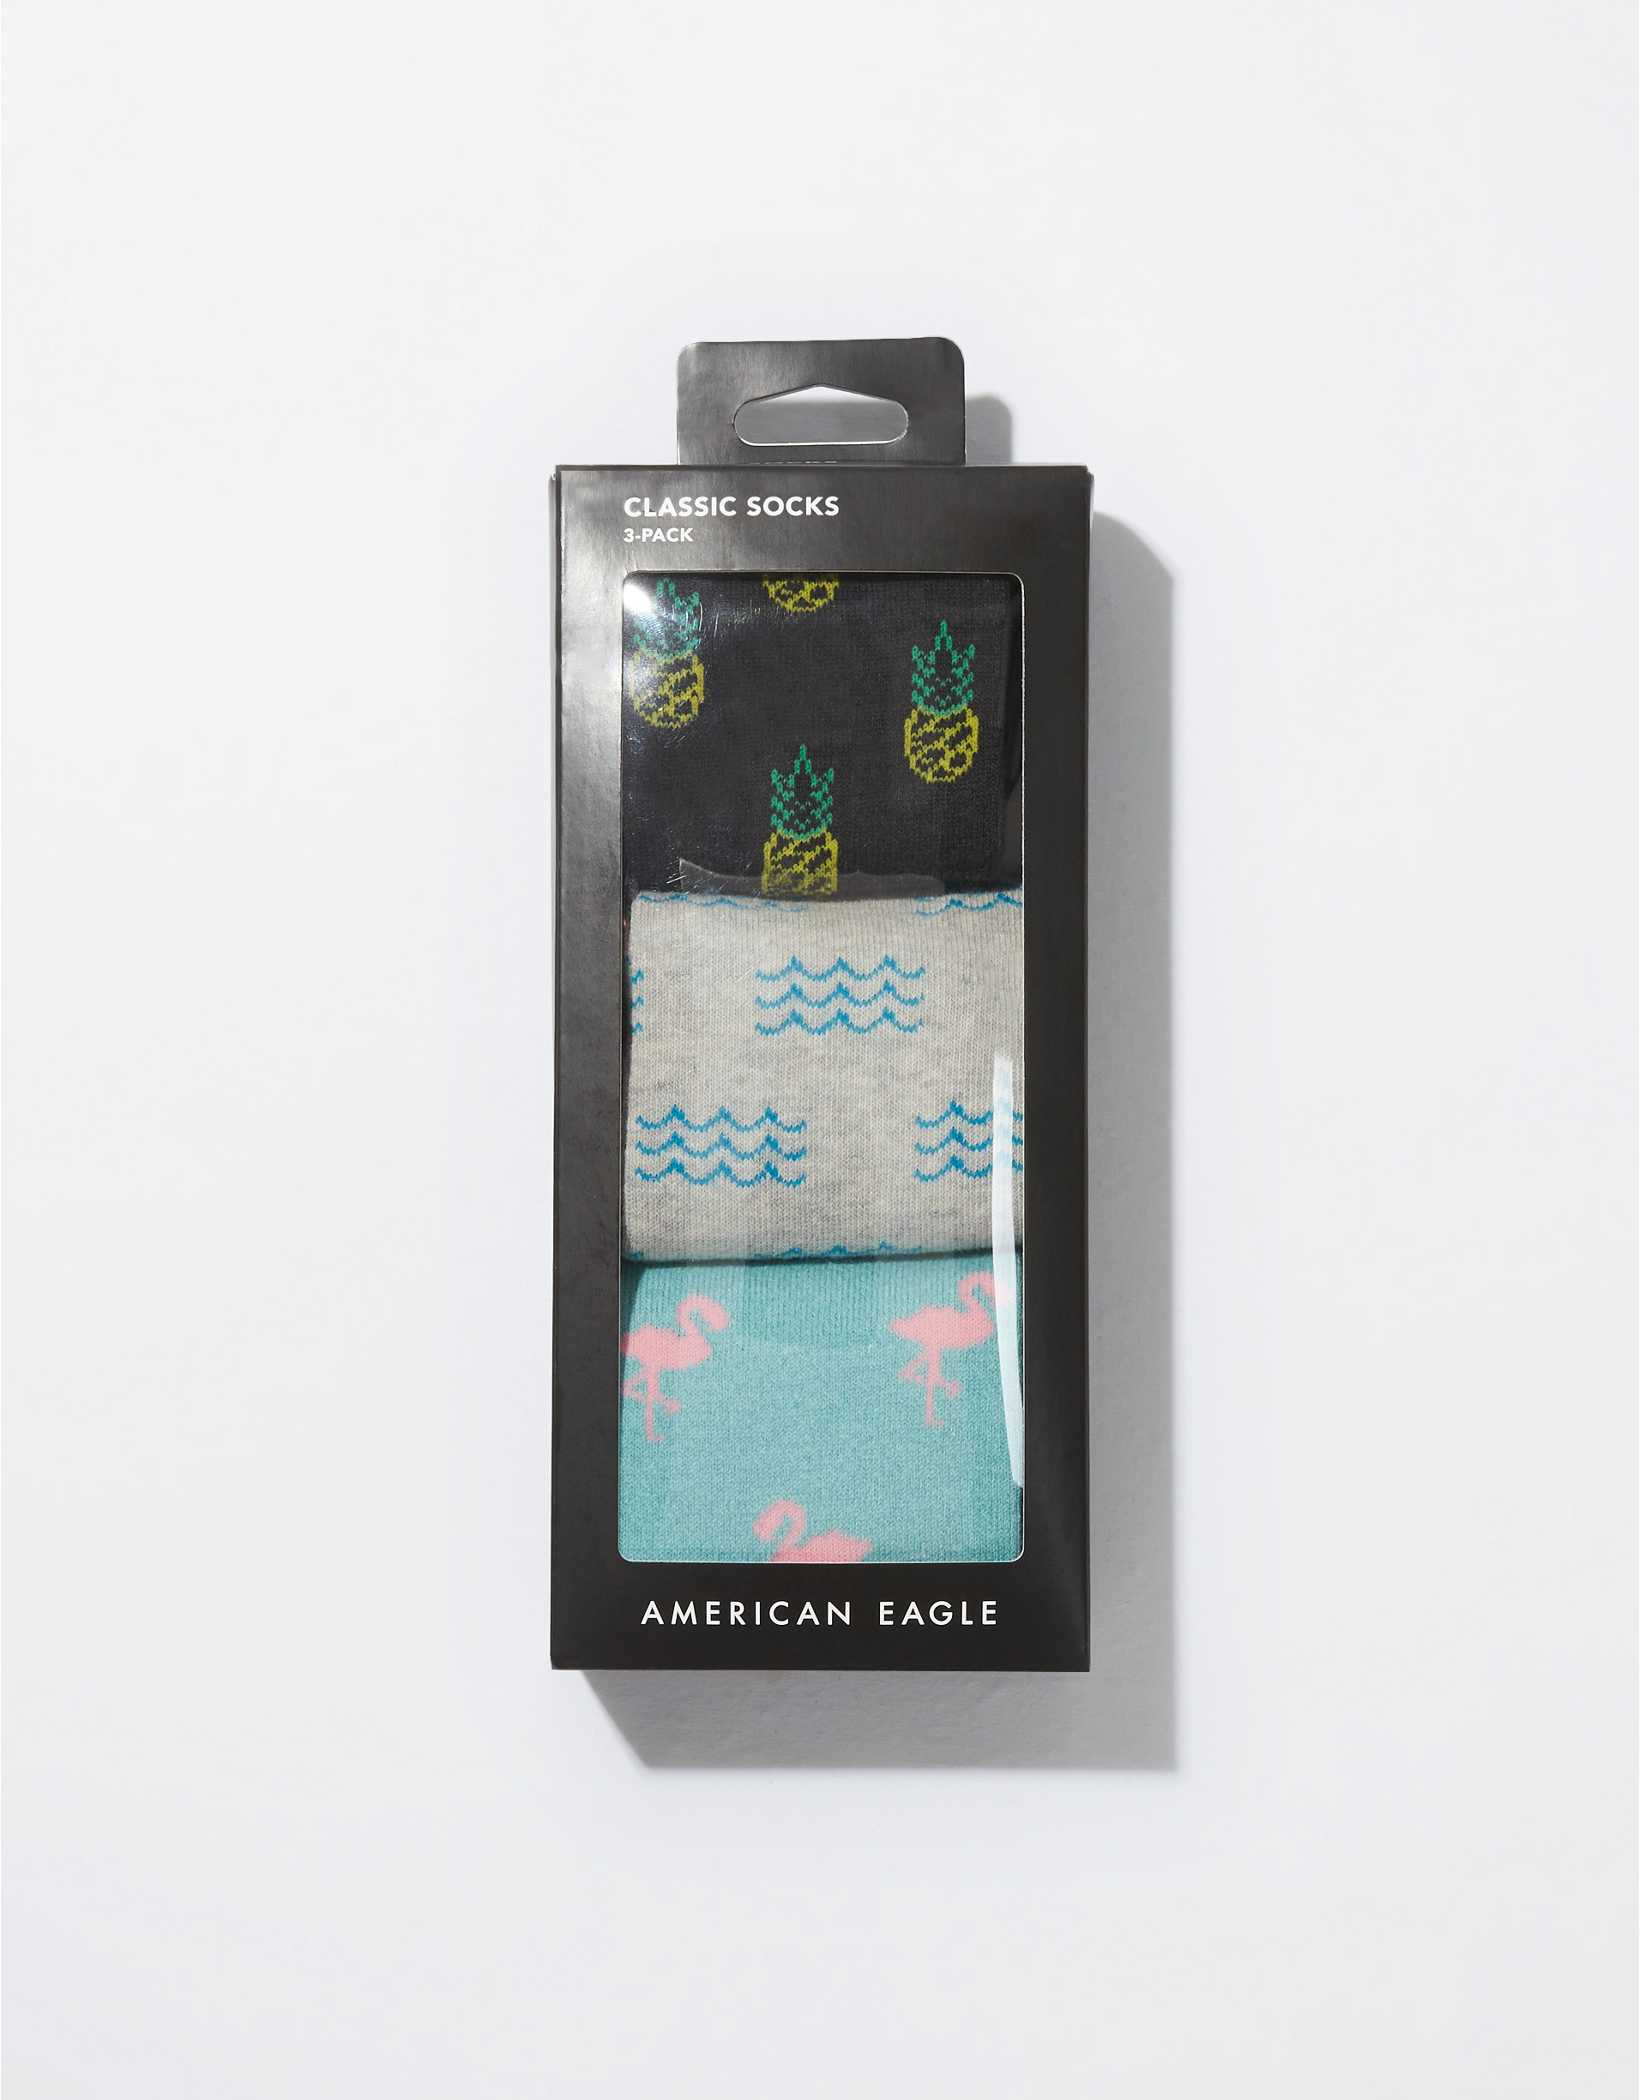 AEO Summer Classic Socks 3-Pack